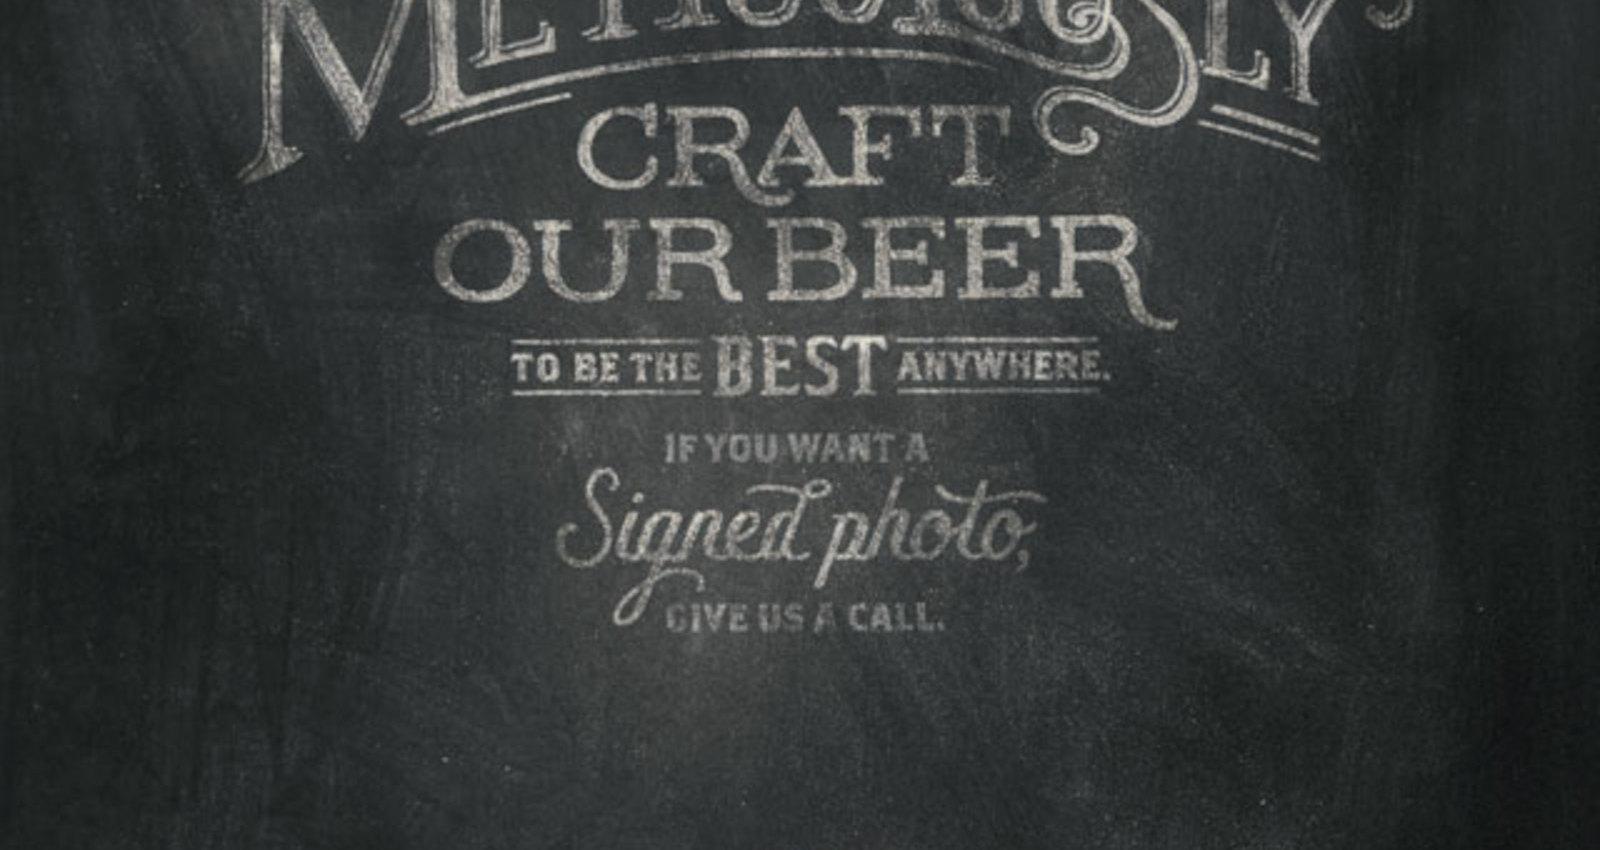 Sponsor of beer